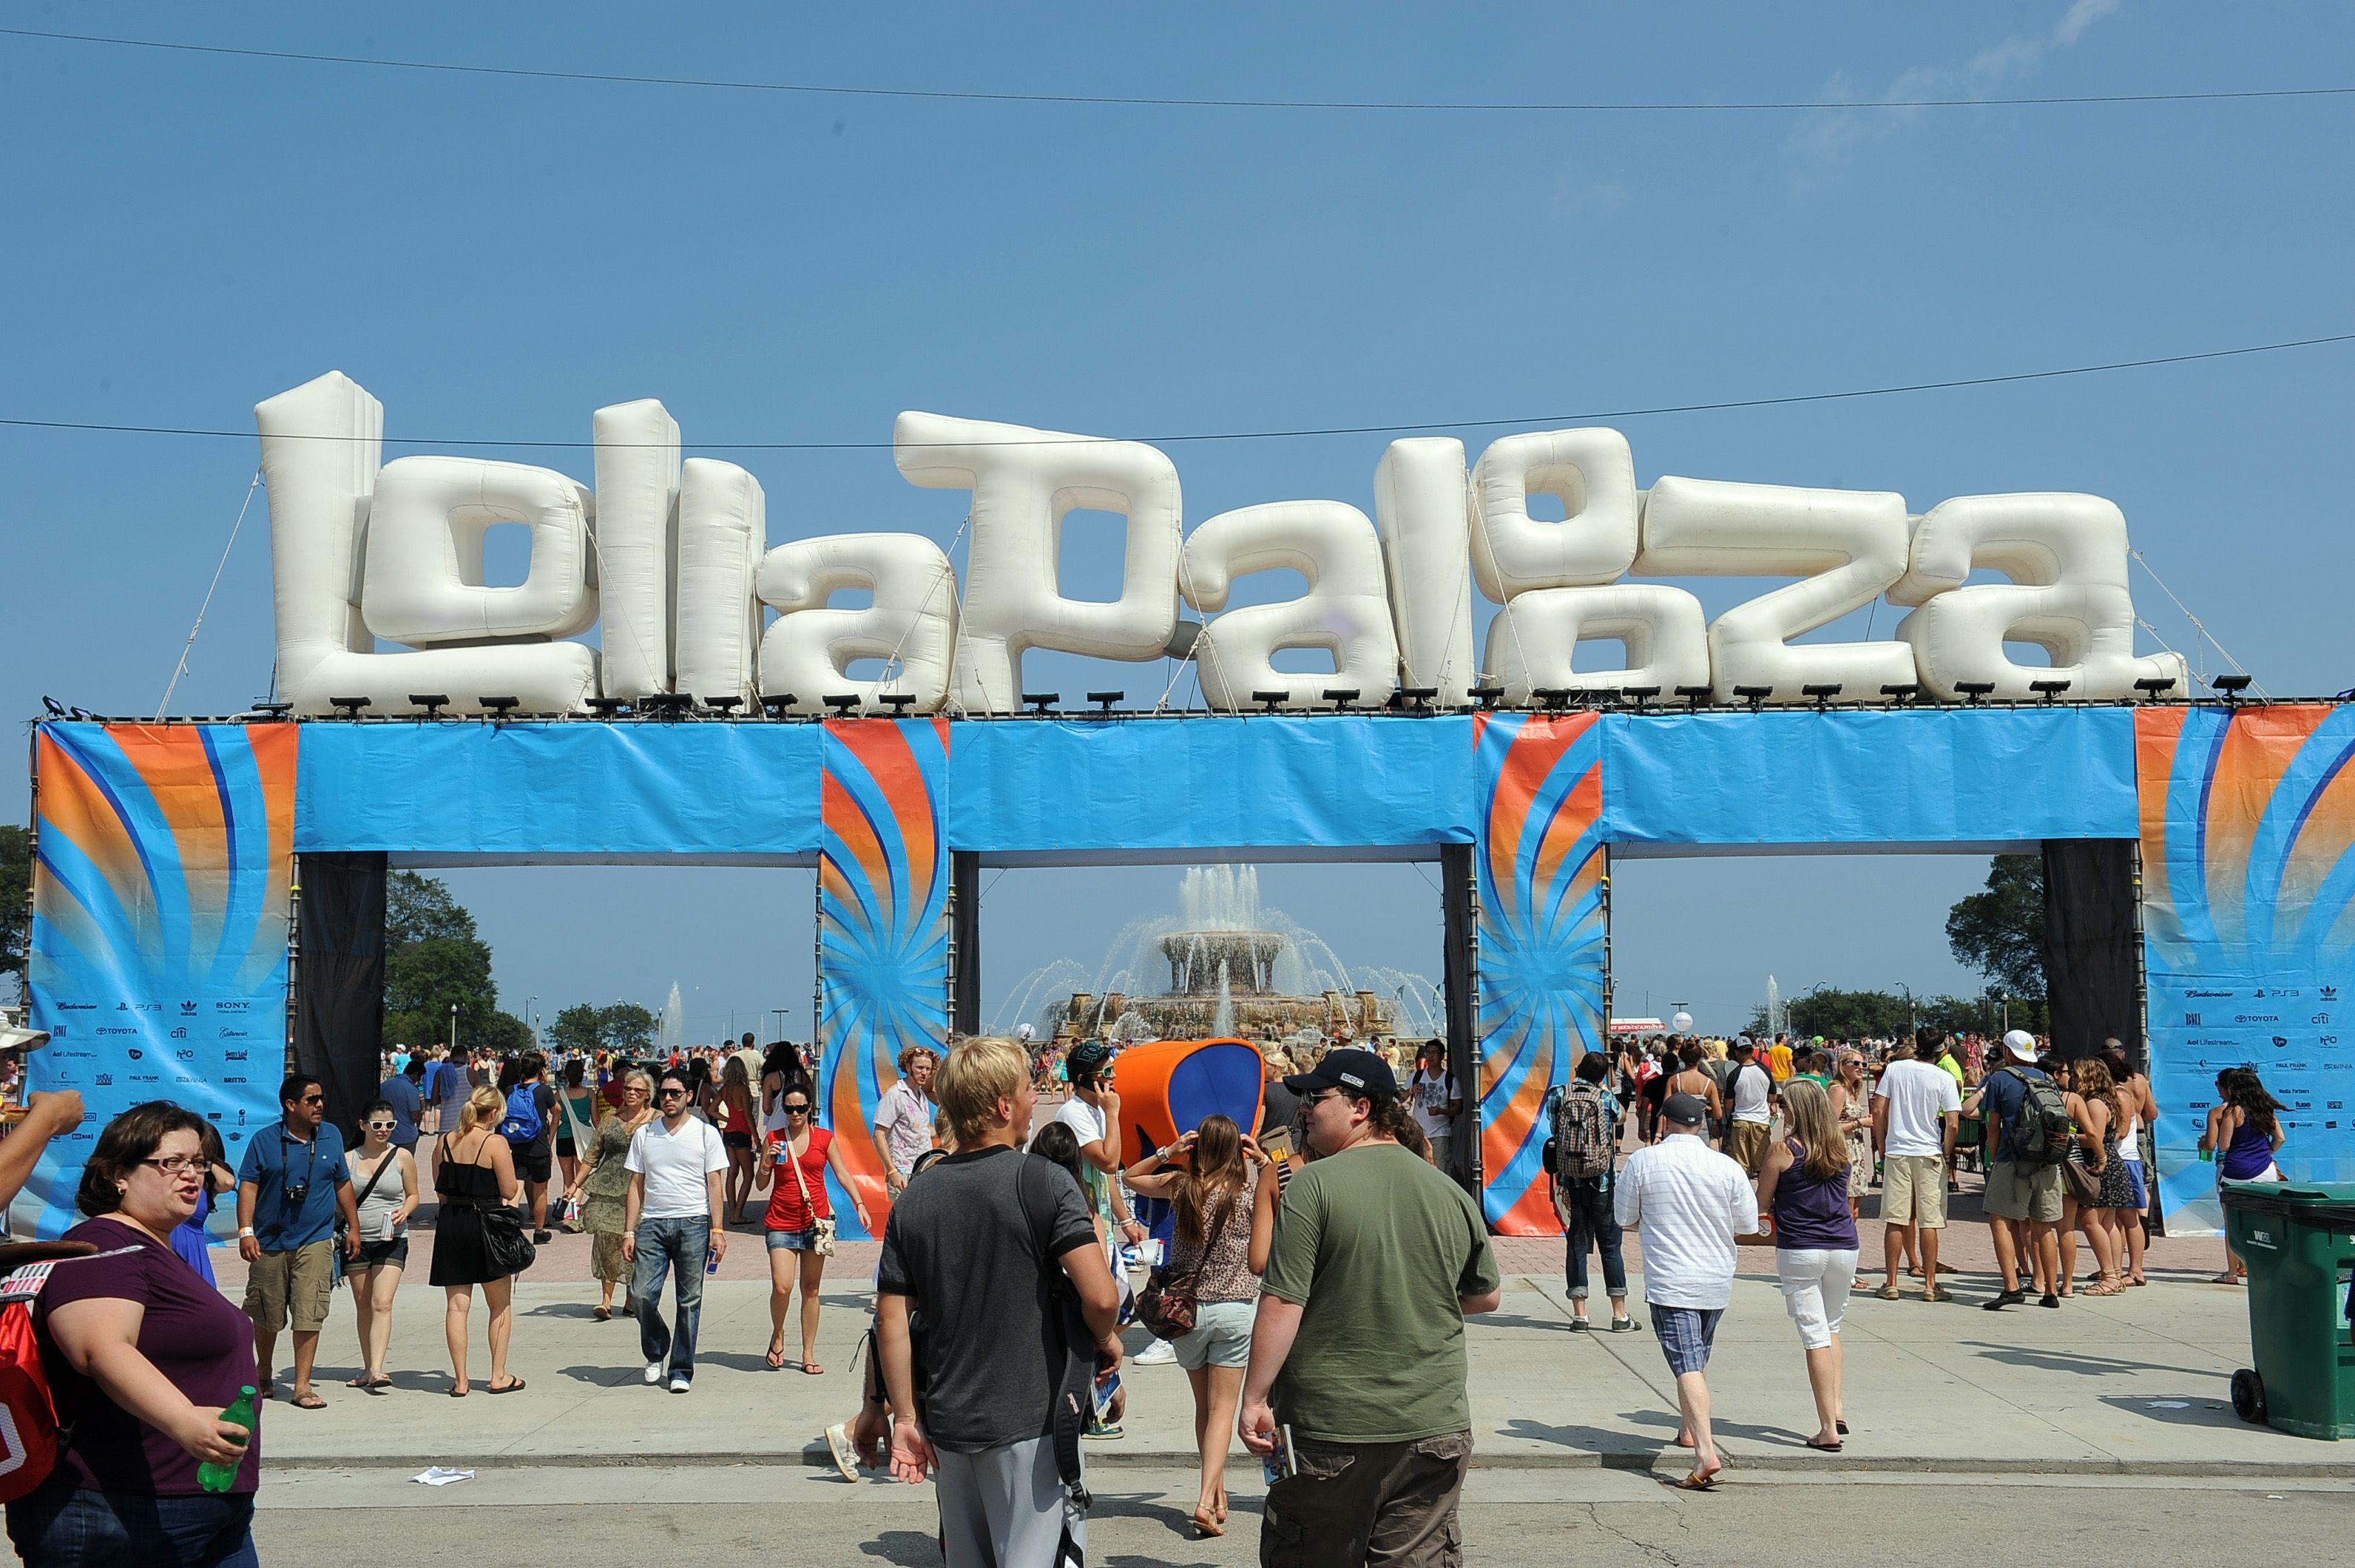 The entrance of LollaPalooza